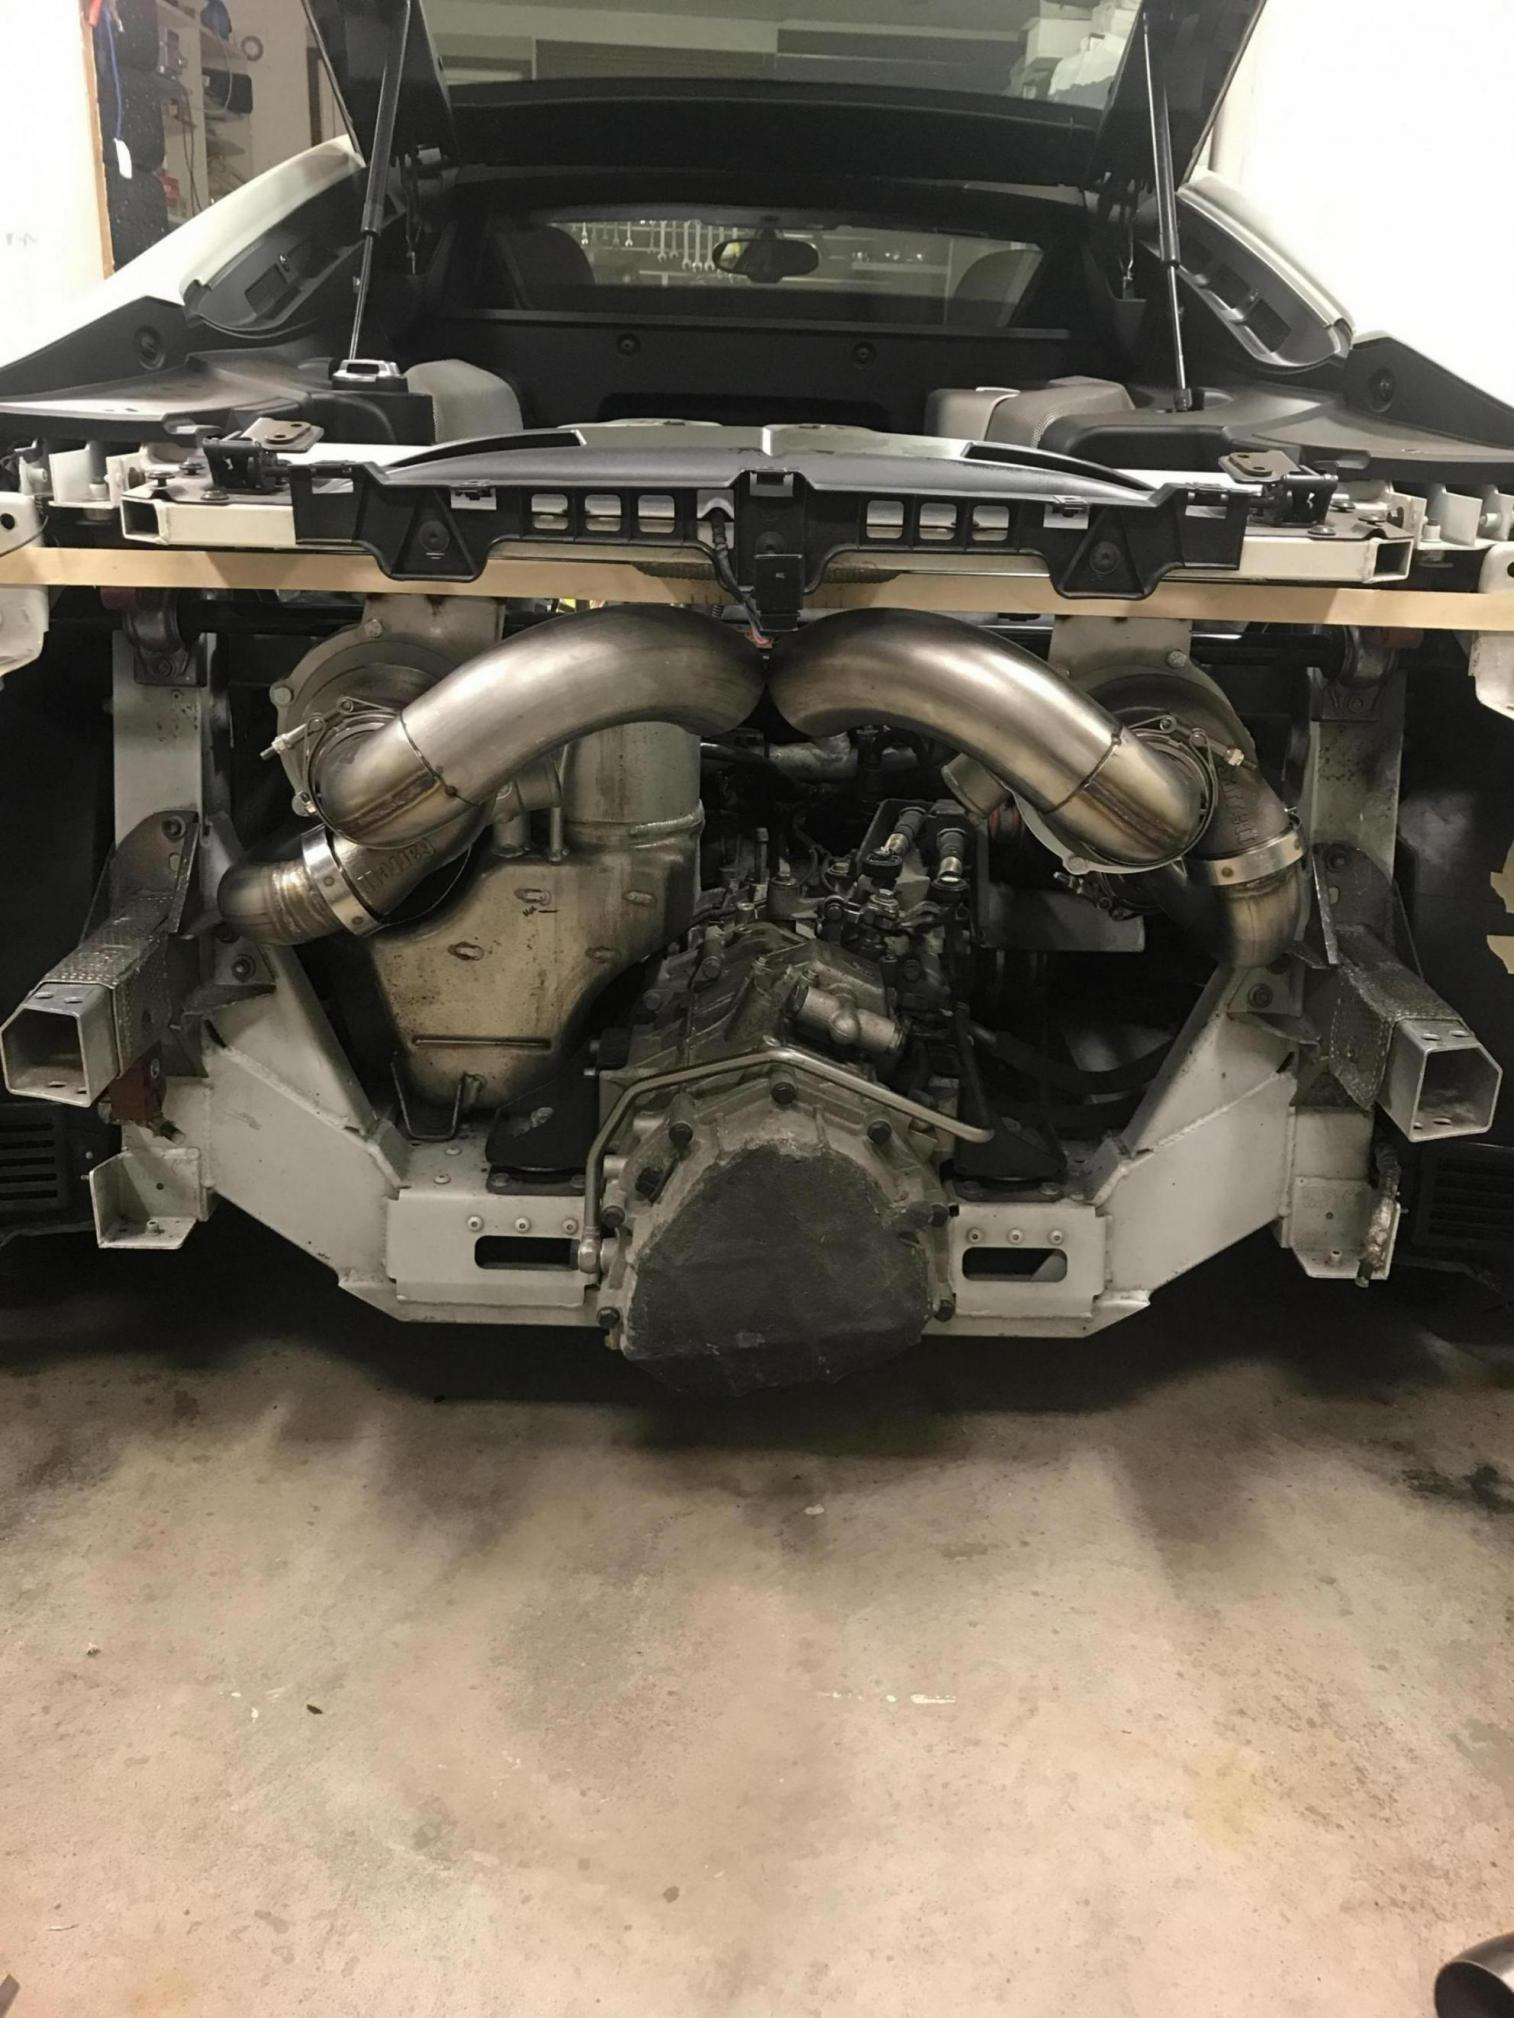 R8 v8 turbo project-img_5107_1540400782607.jpg